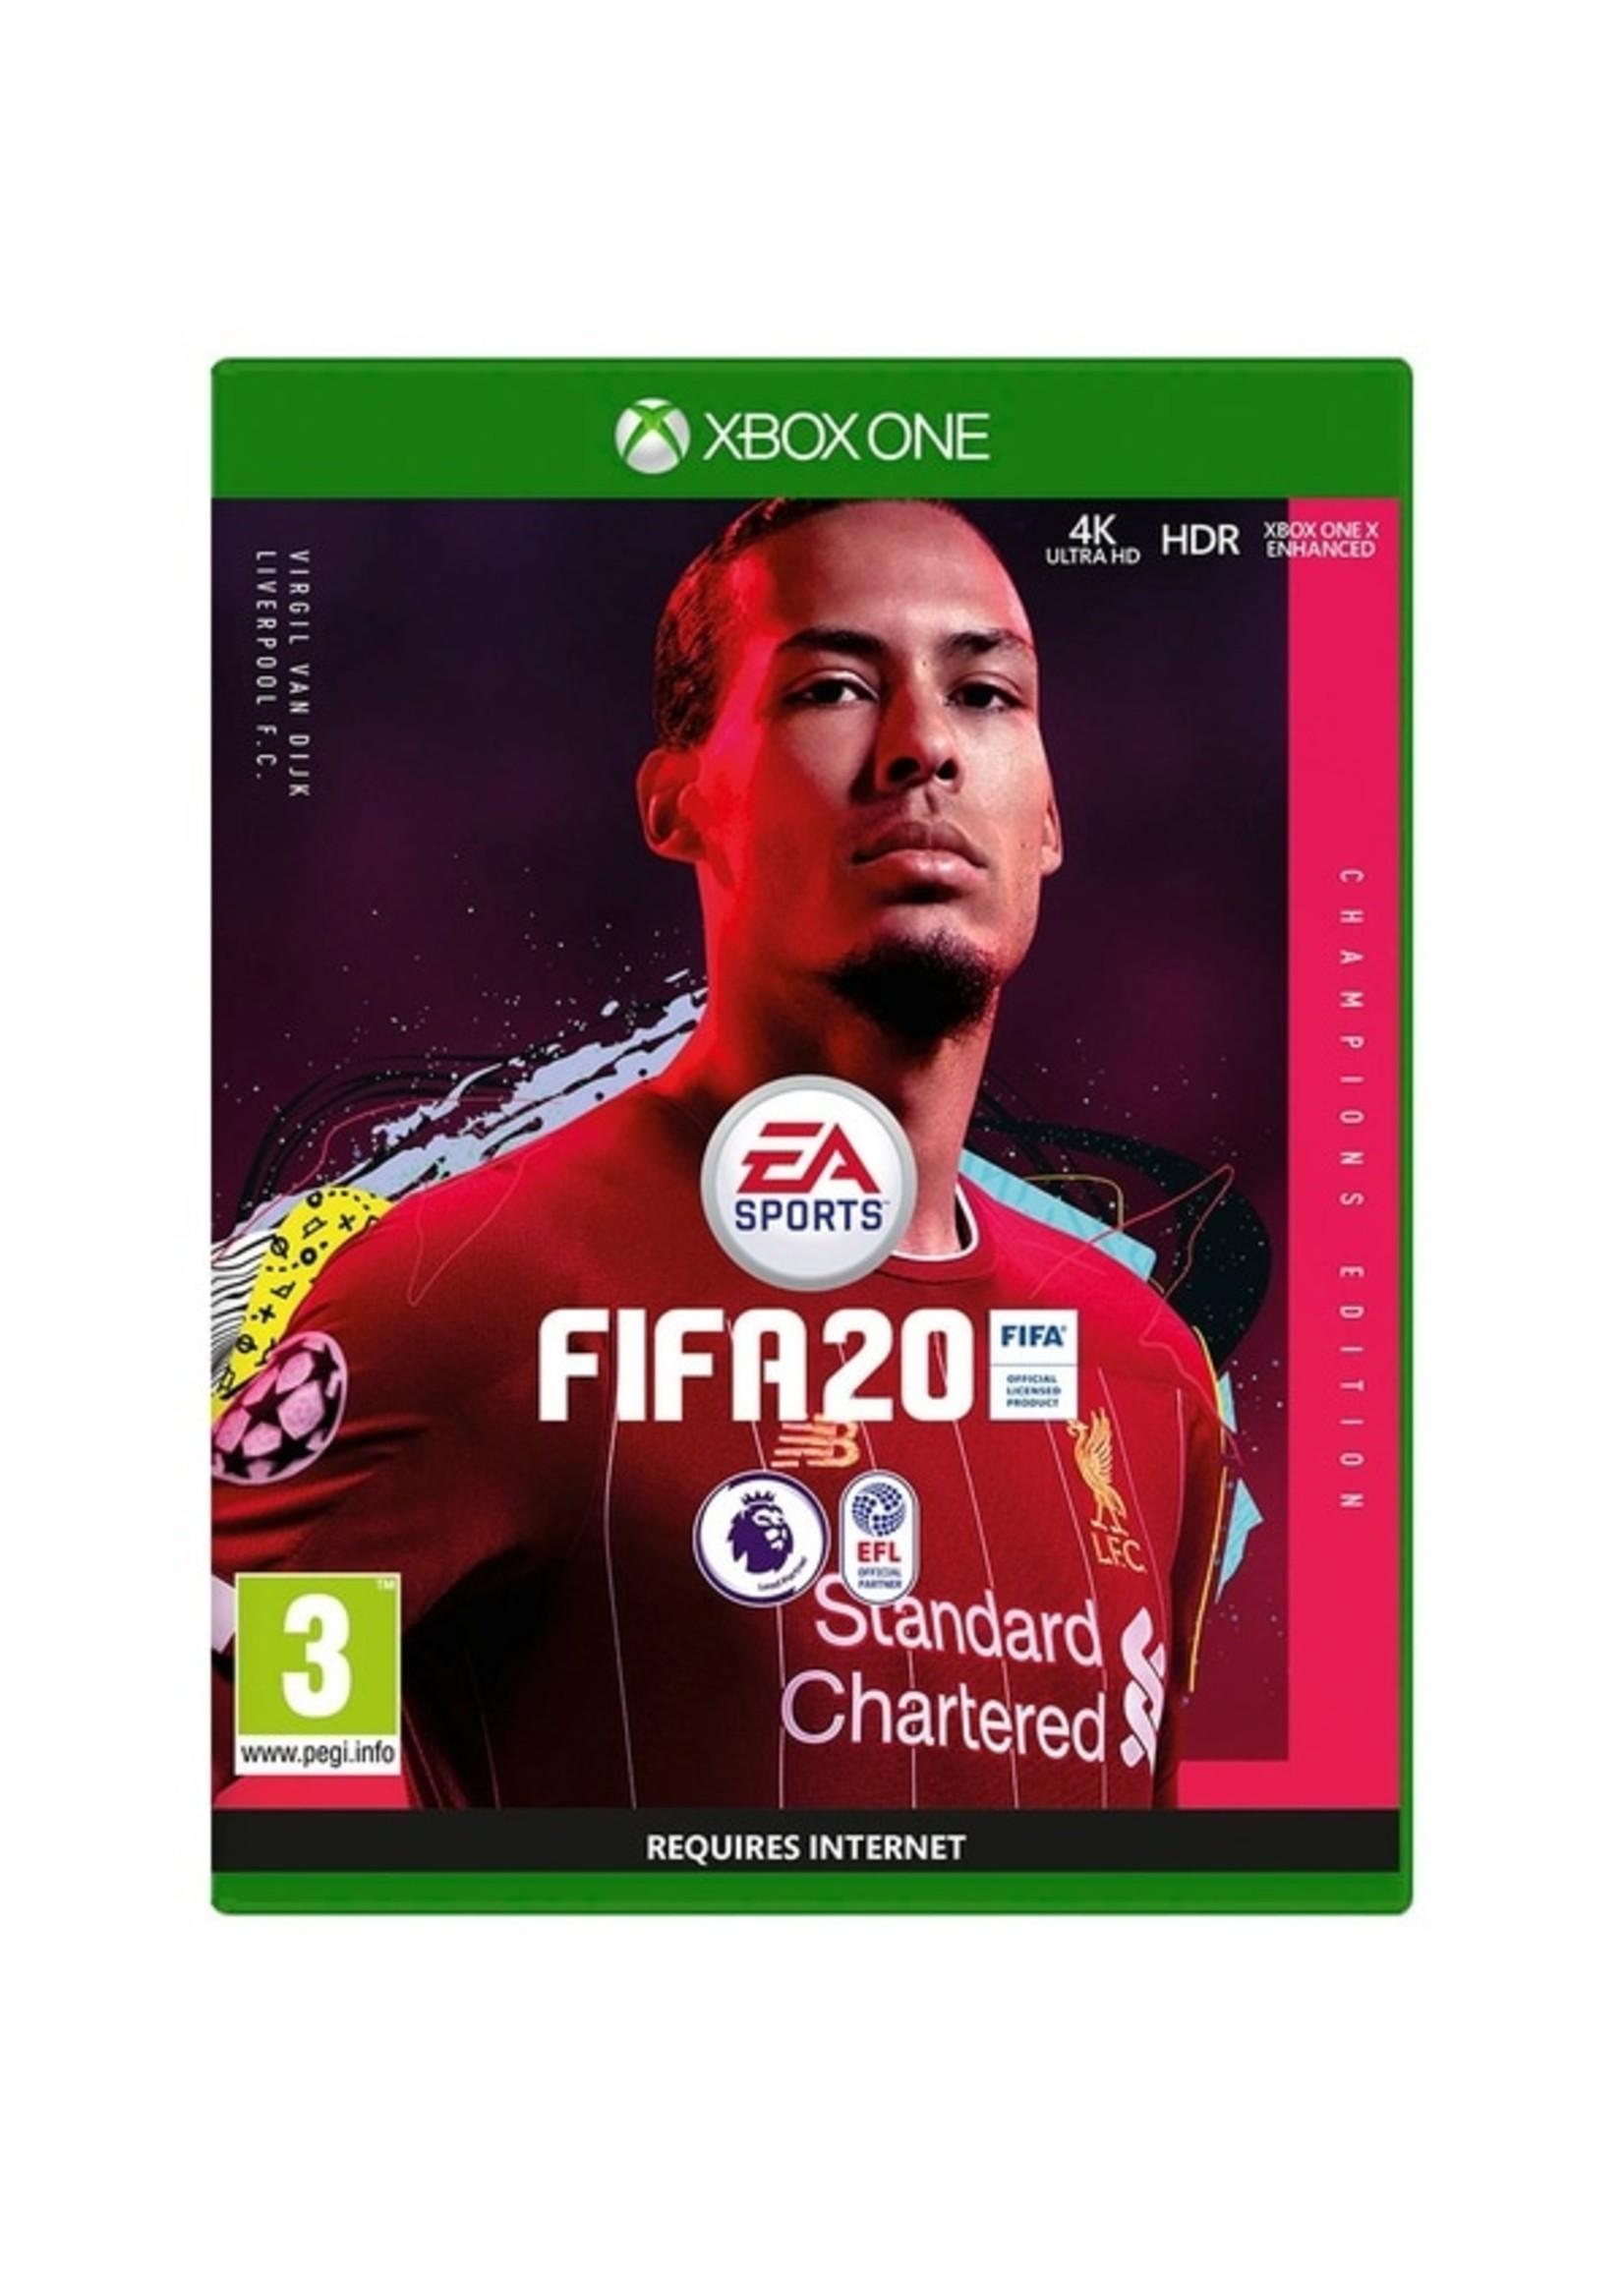 FIFA 20 Champions Edition - XBOne NEW